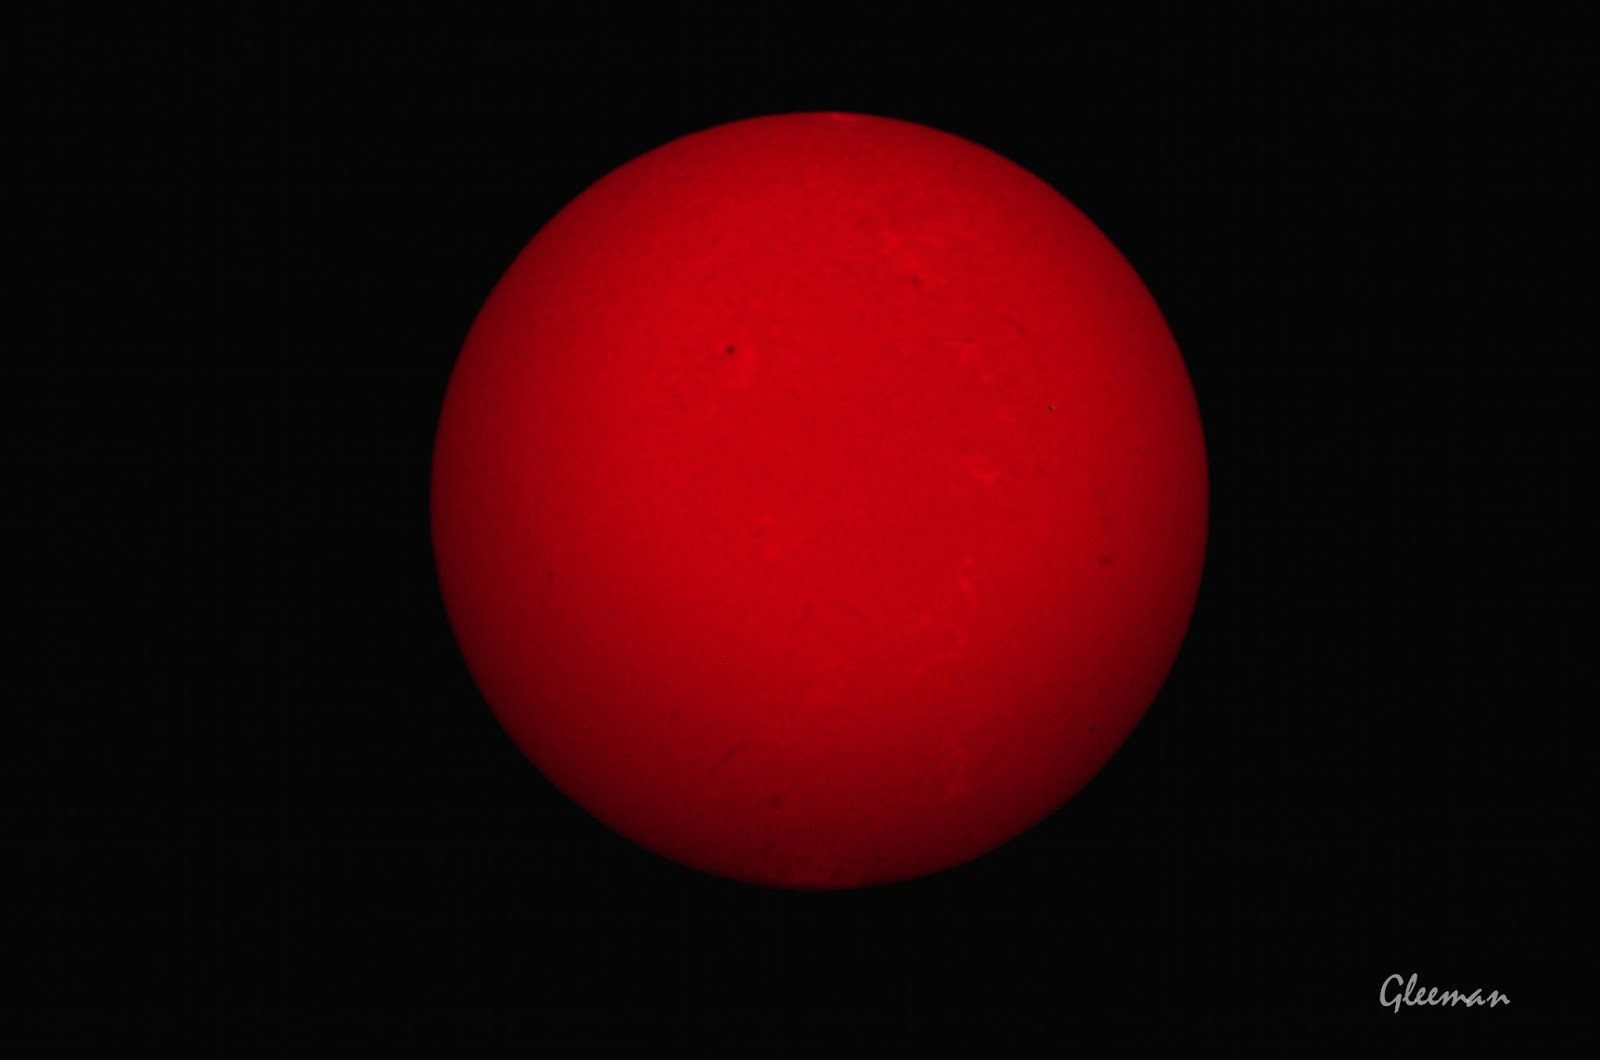 太陽 H-Alpha 擴大攝影, Pentax 75SDHF/Baader 8-24mm目鏡(設在20mm)/Pentax K5 Pentax MS-3赤道儀 SolarMax II 40 H-Alpha濾鏡